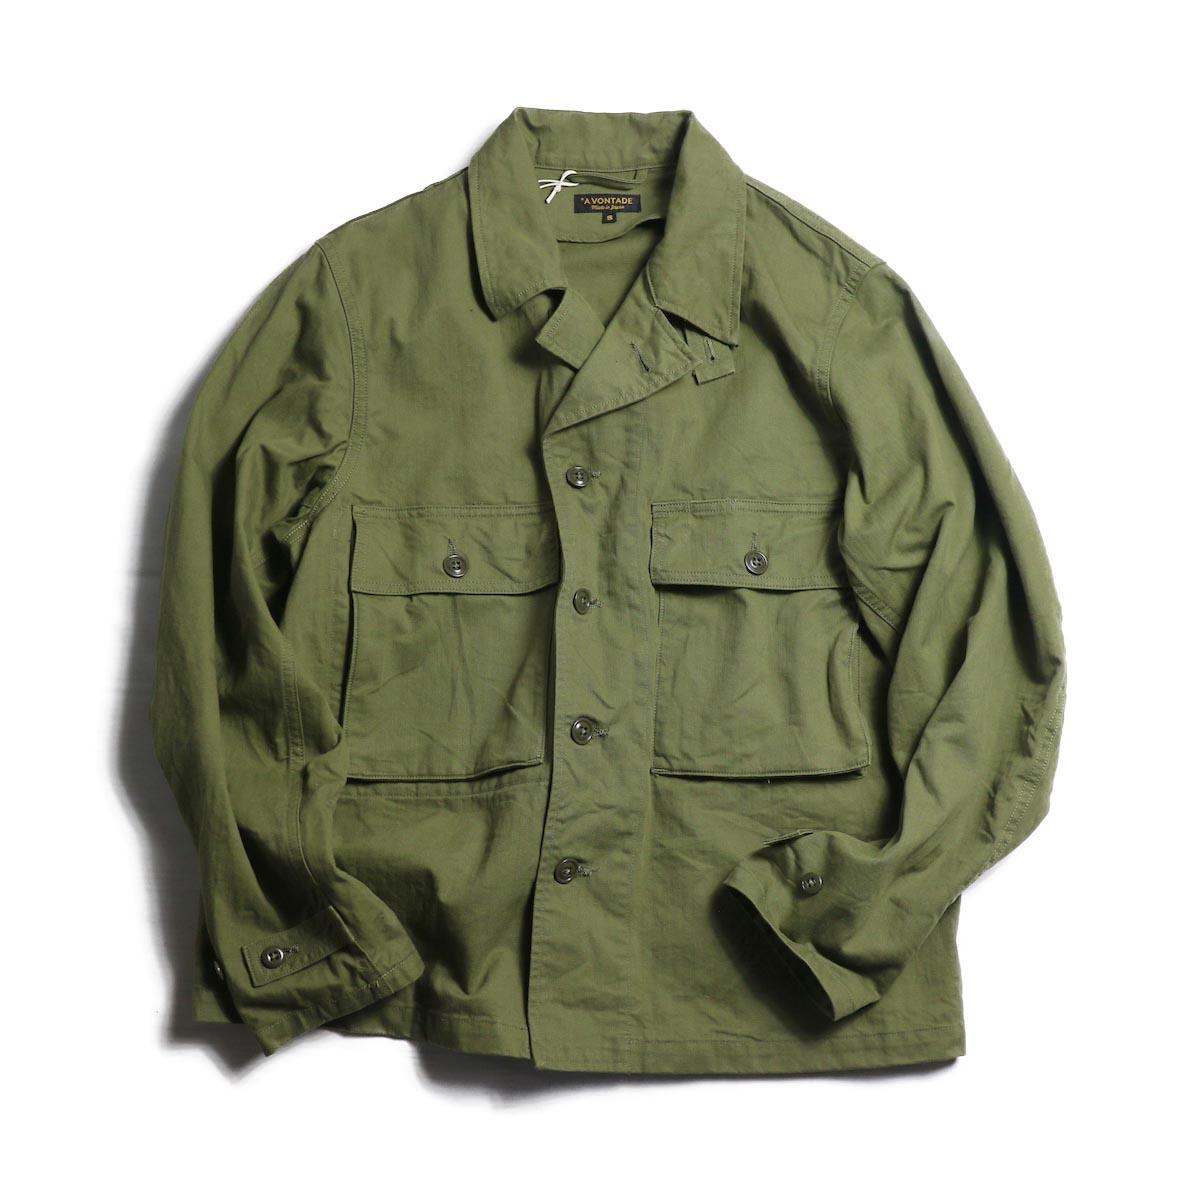 A VONTADE / Short Fatigue Jacket -OLIVE